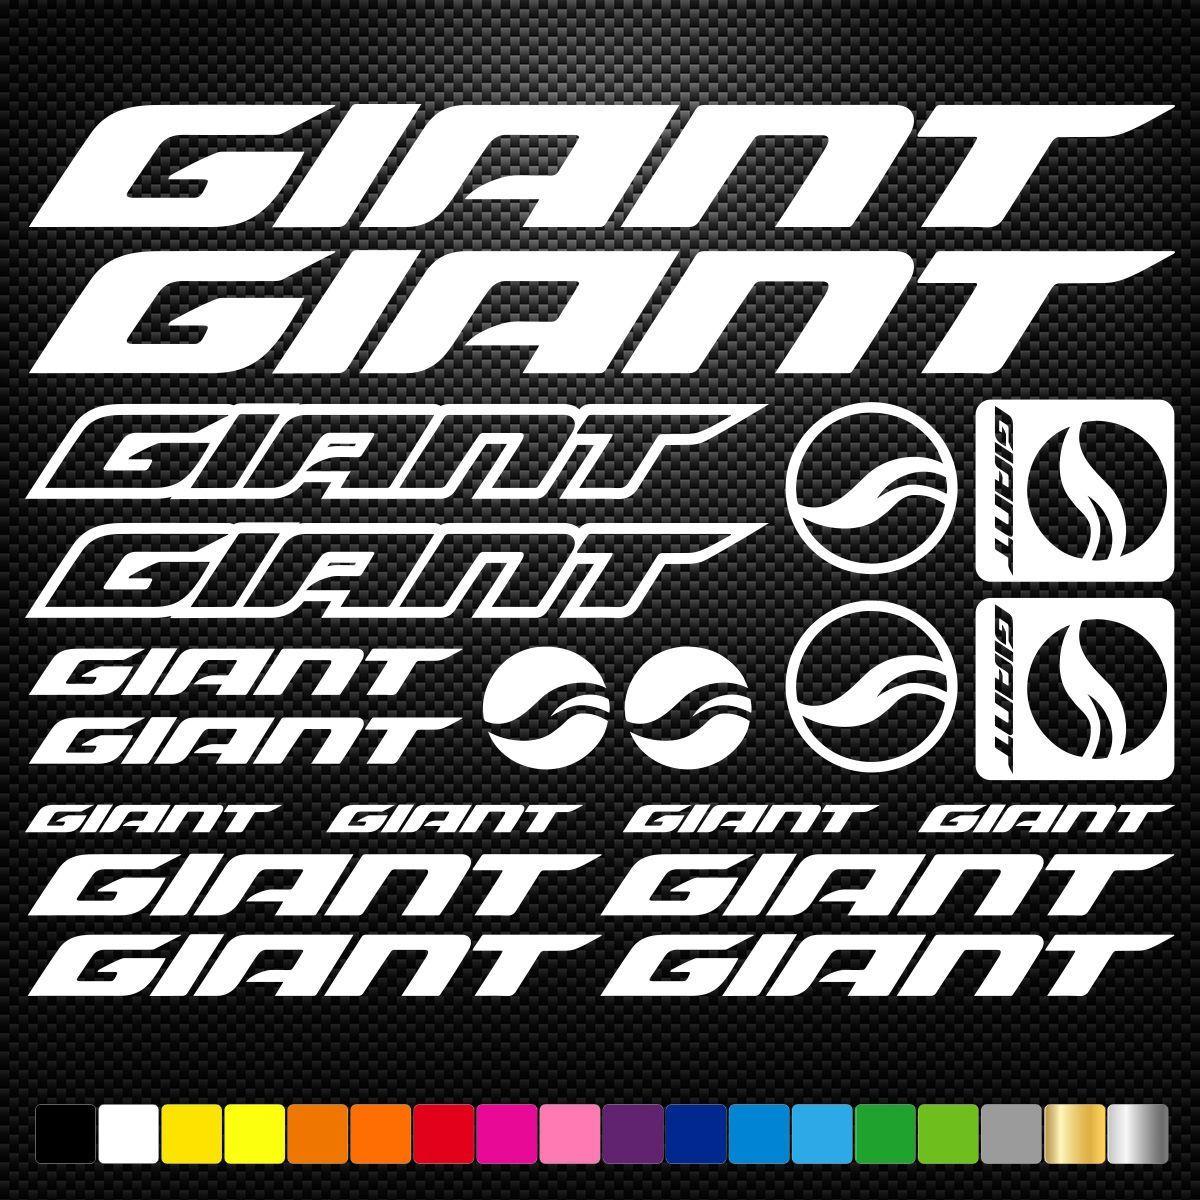 Giant Vinyl Decal Stickers Sheet Bike Frame Cycle Cycling Bicycle Mtb Road Mtblogo Bike Stickers Giant Bikes Bike Frame [ 1200 x 1200 Pixel ]